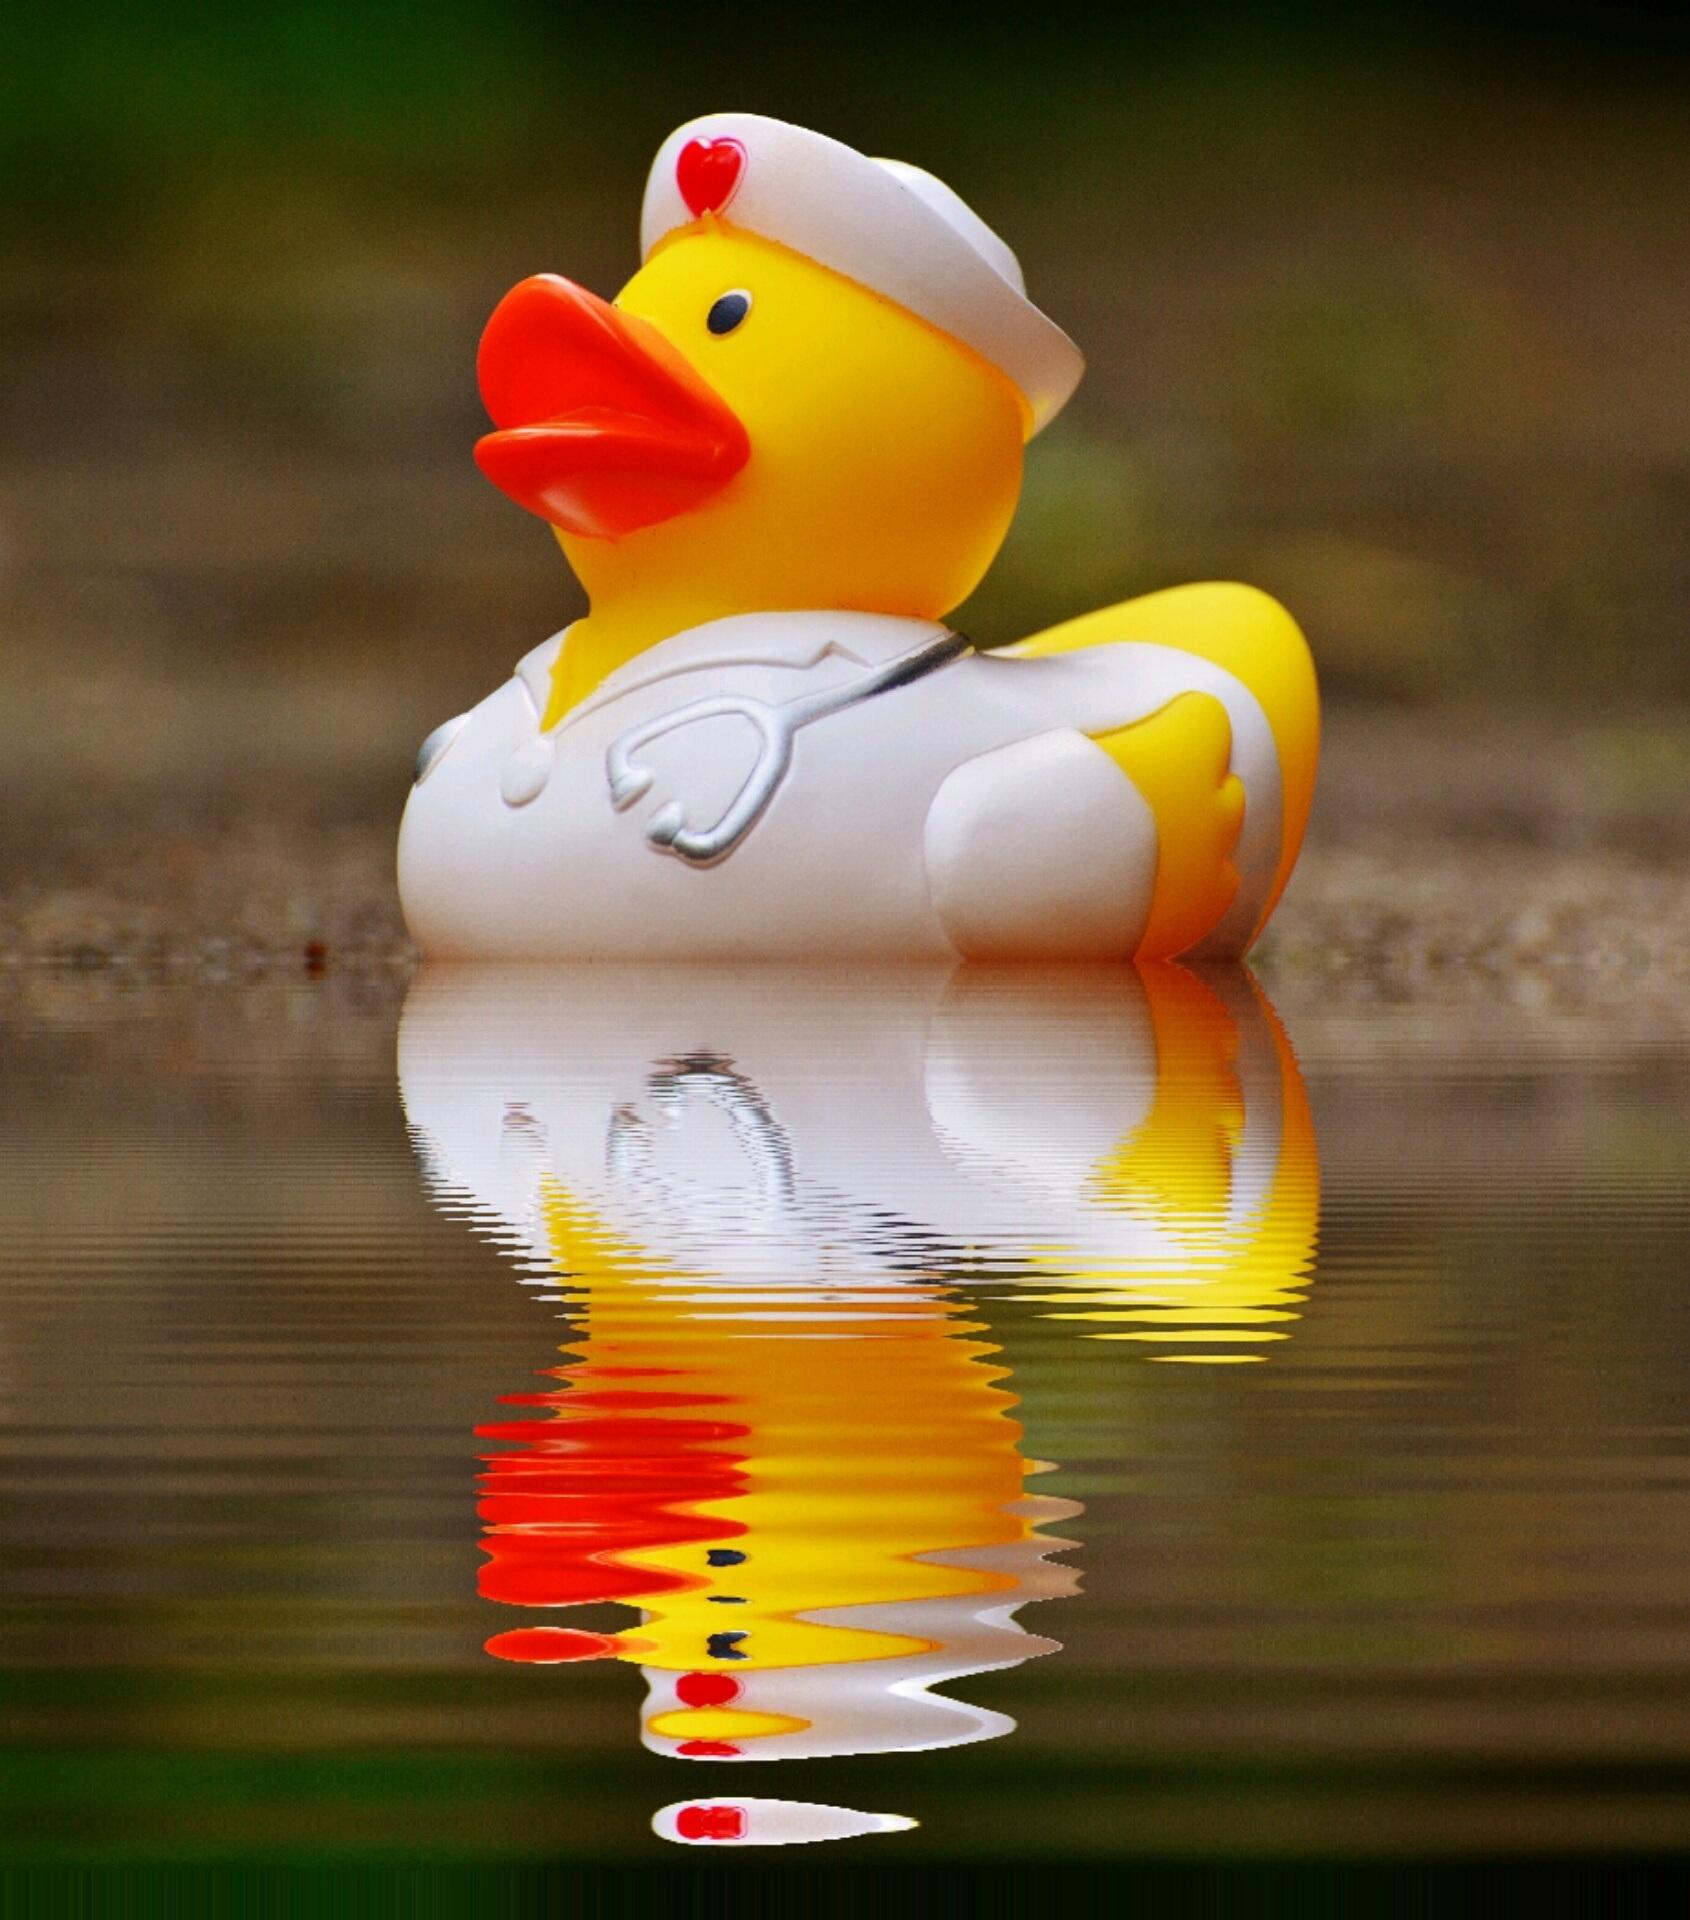 Free Images : sweet, cute, swim, beak, color, yellow, figure ...